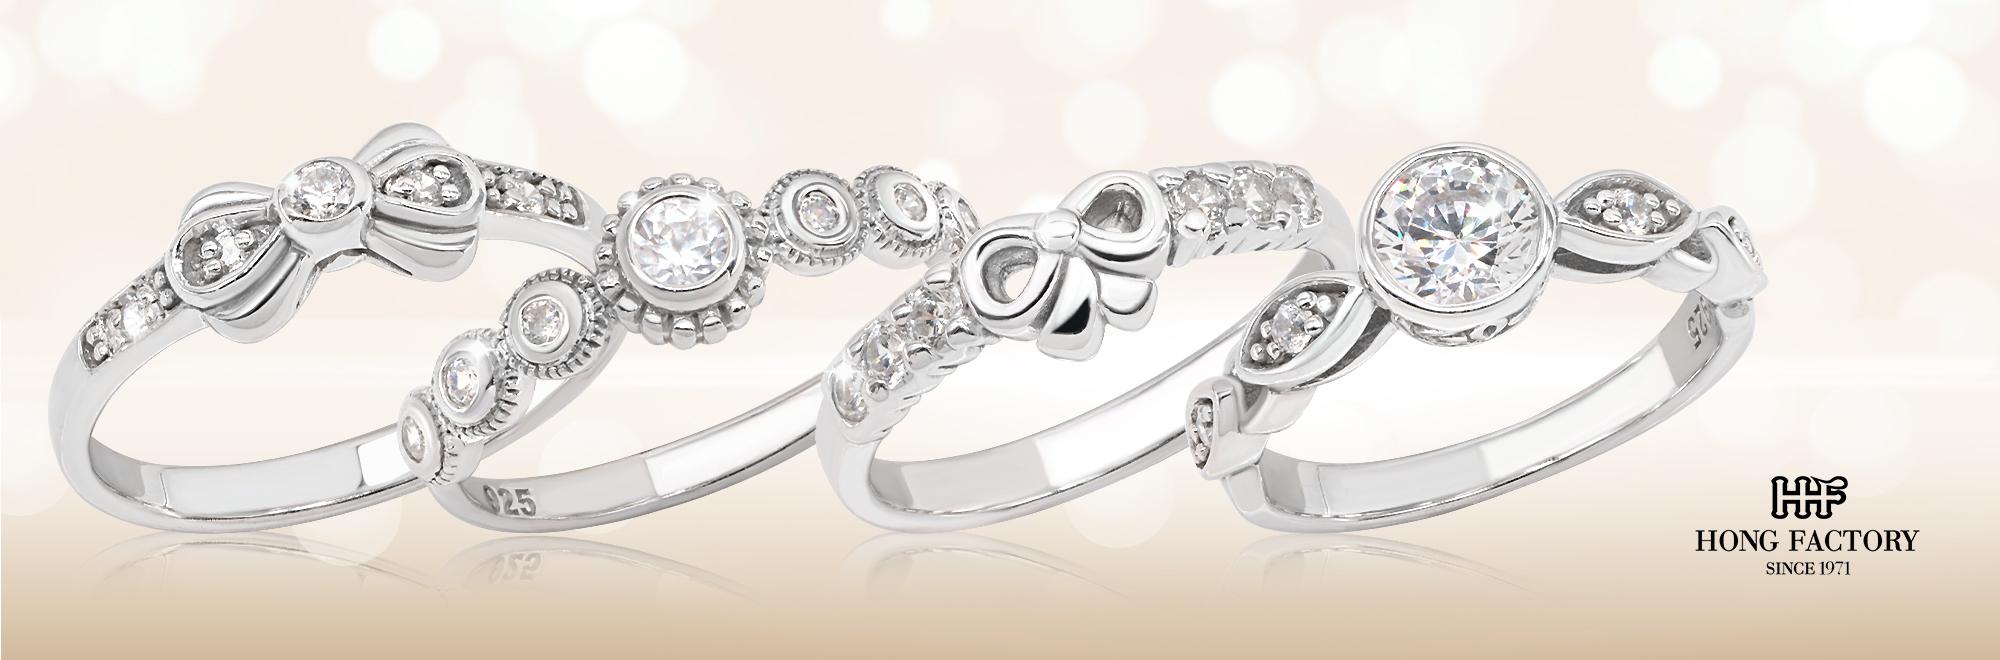 Slide Wholesale Jewelry 501